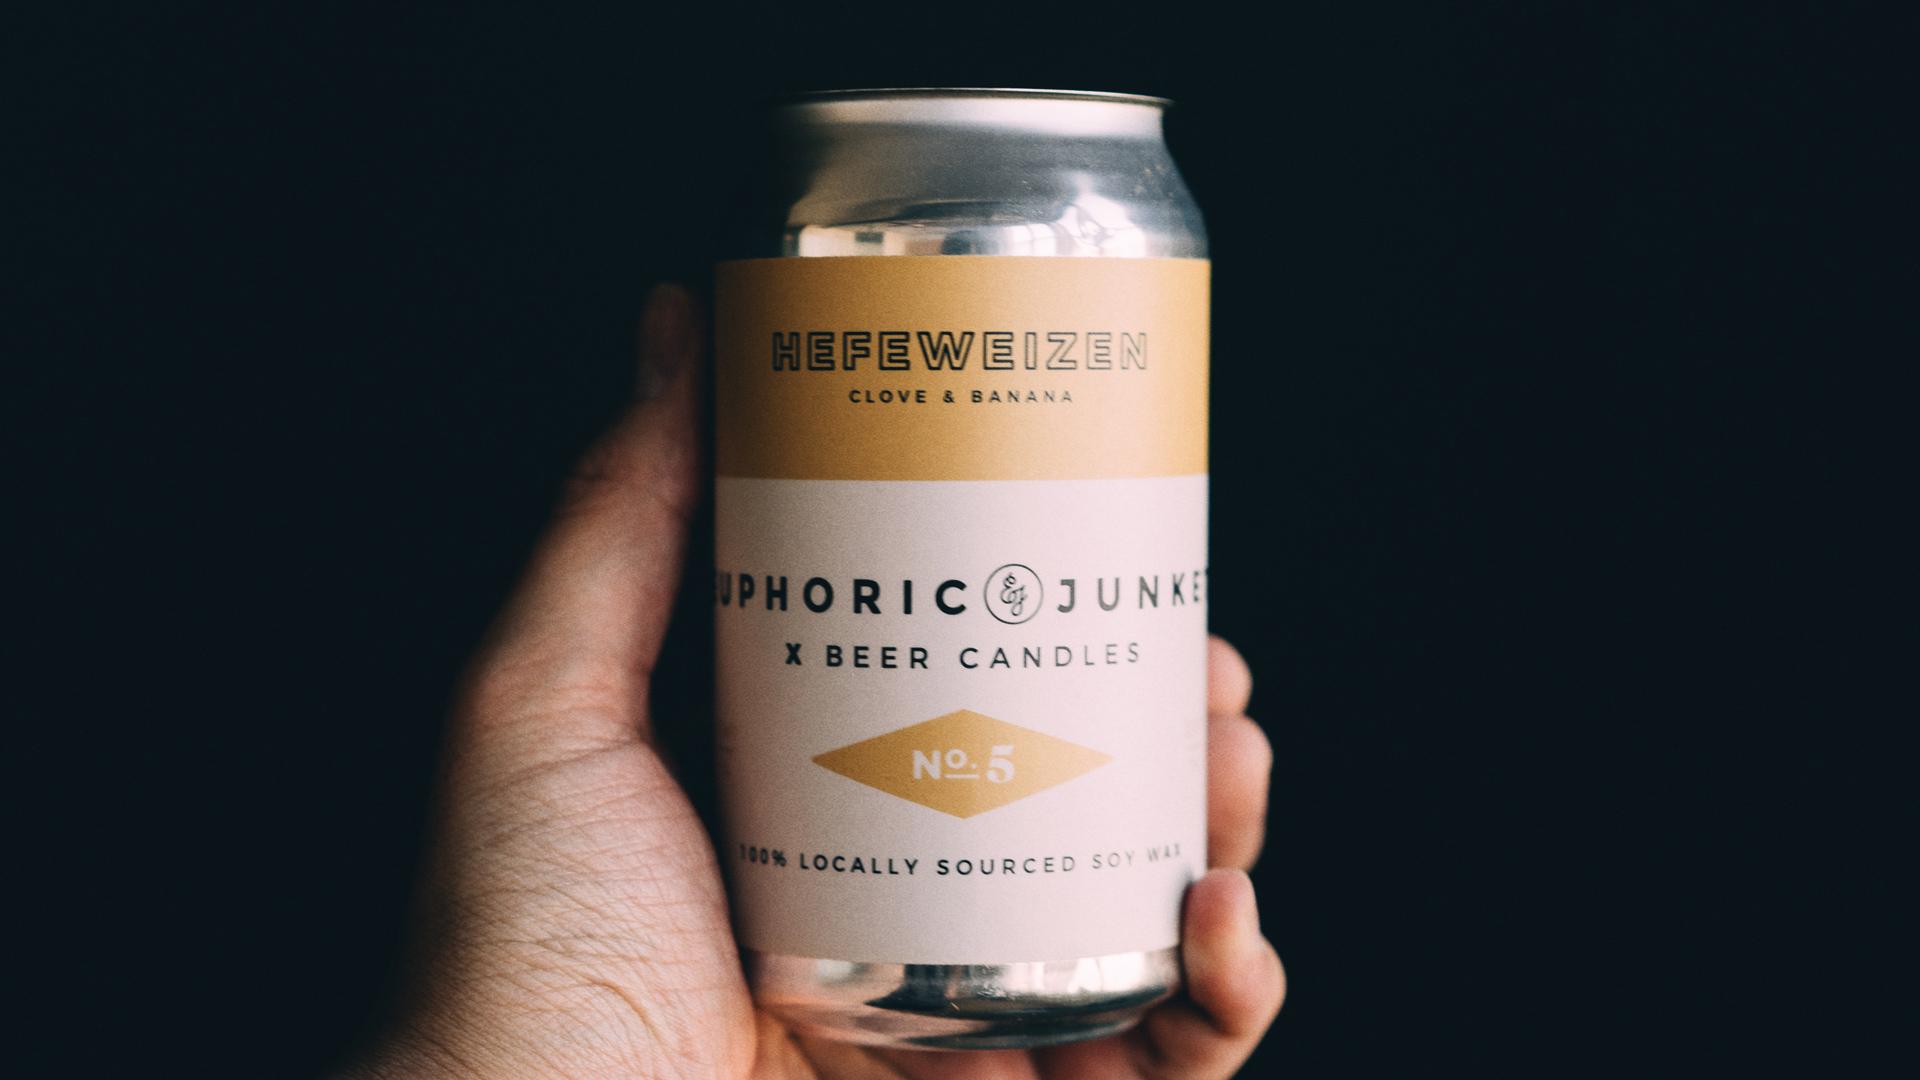 Euphoric Junket – Brand World